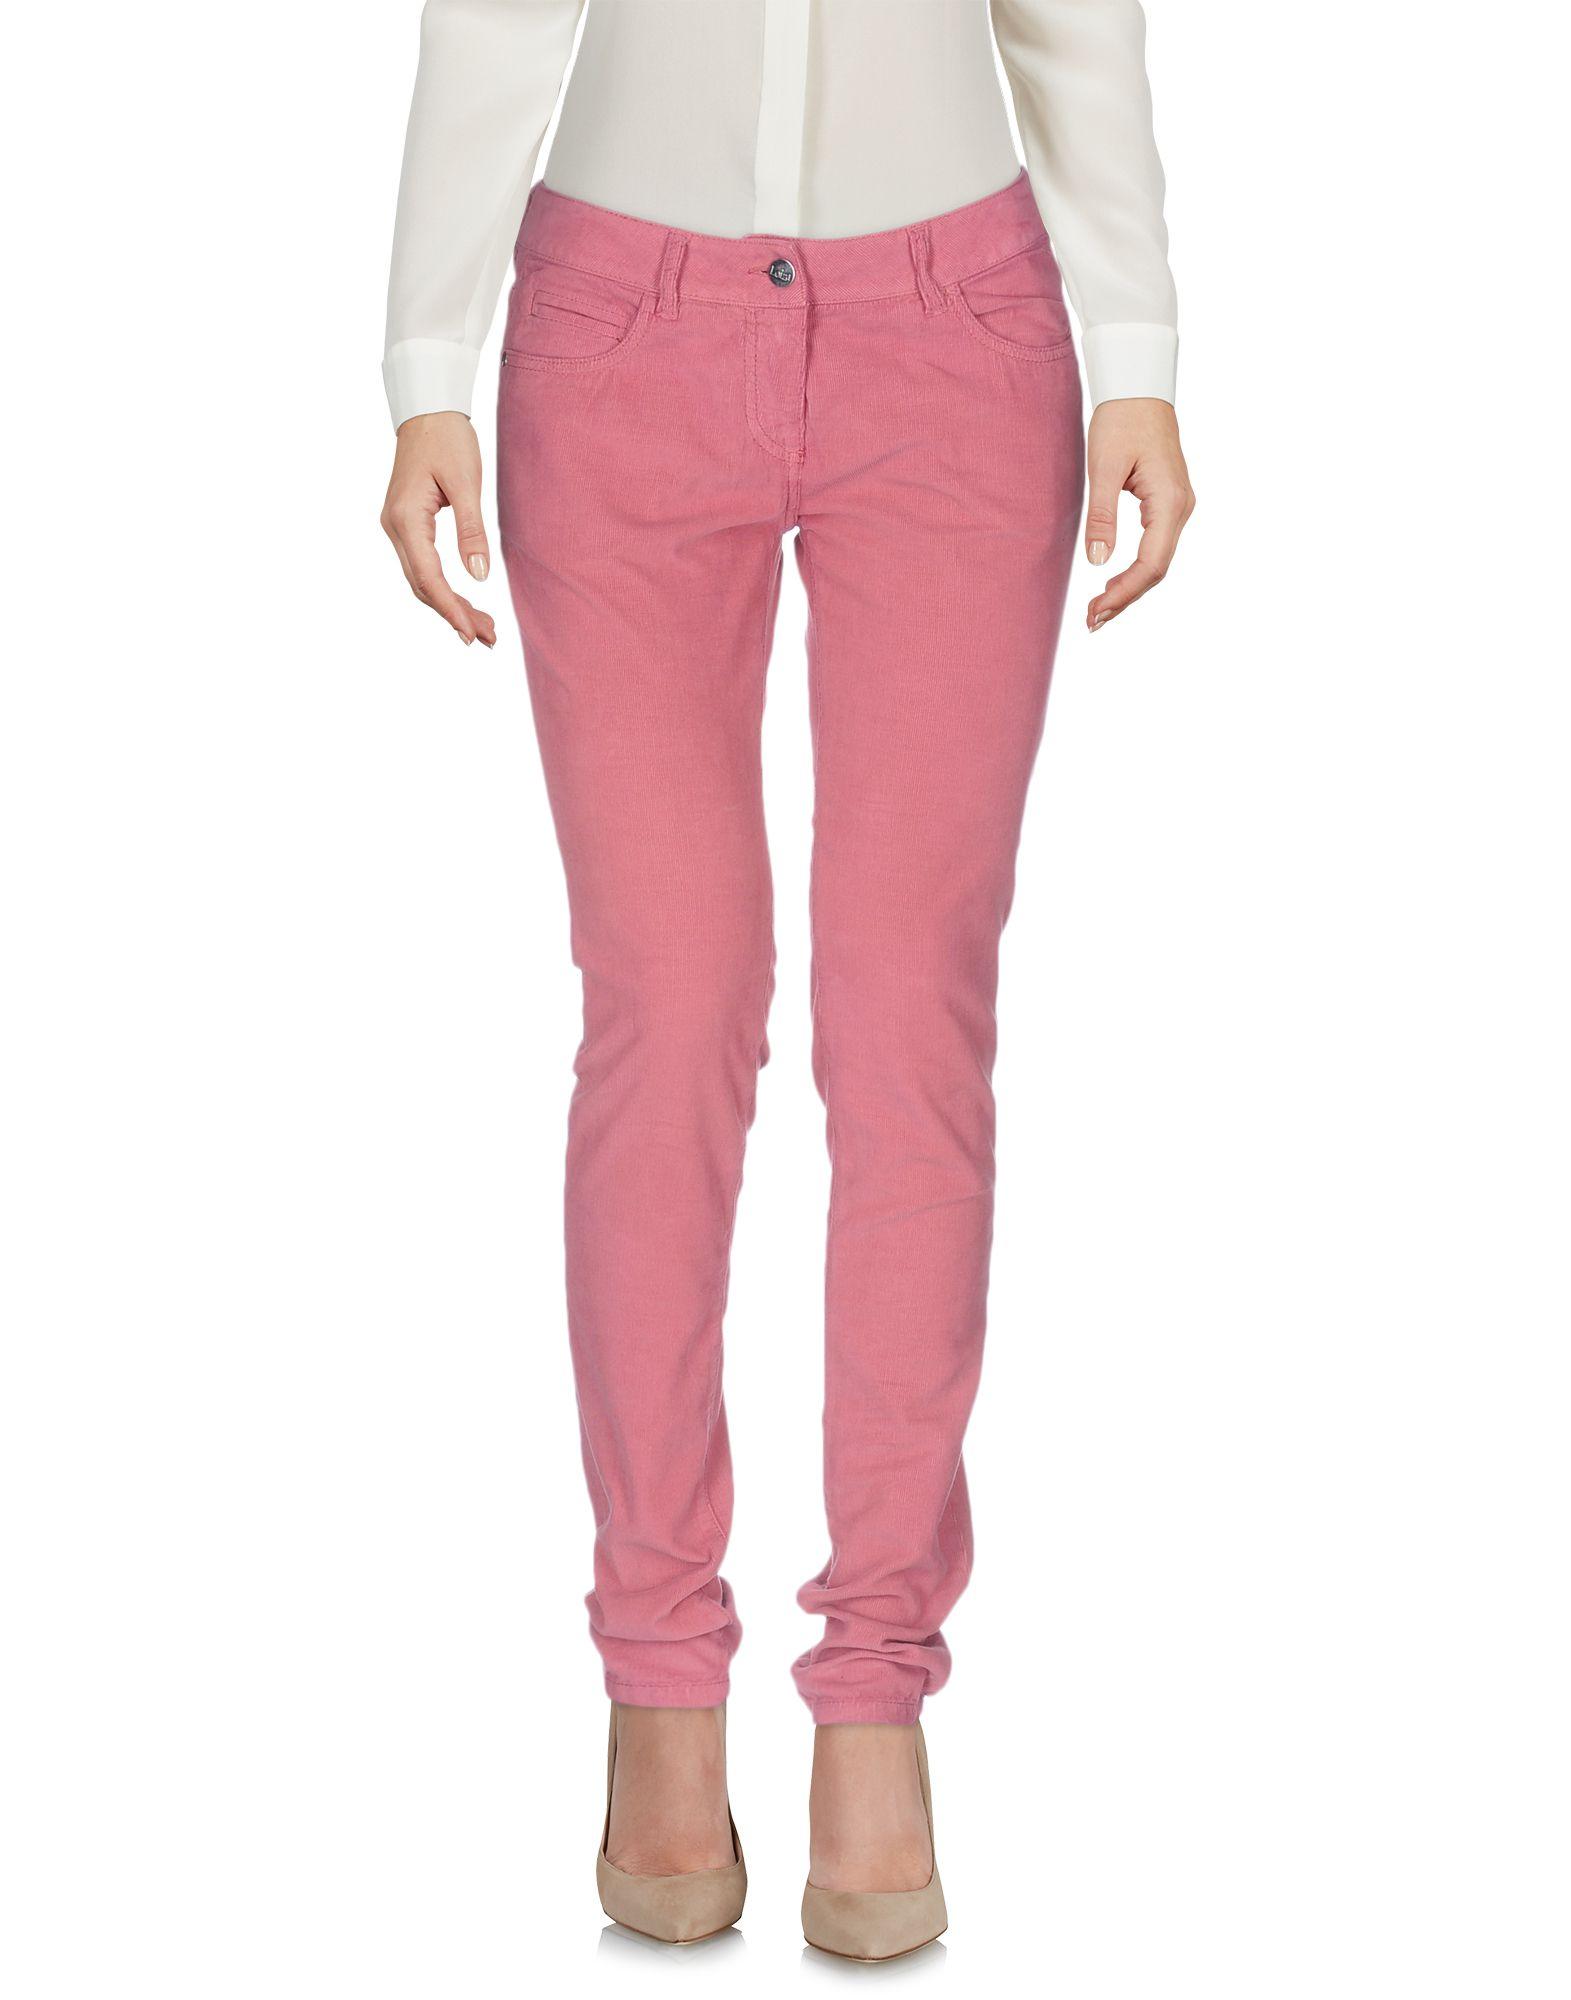 LOIZA by PATRIZIA PEPE Повседневные брюки брюки quelle patrizia dini by heine 157610